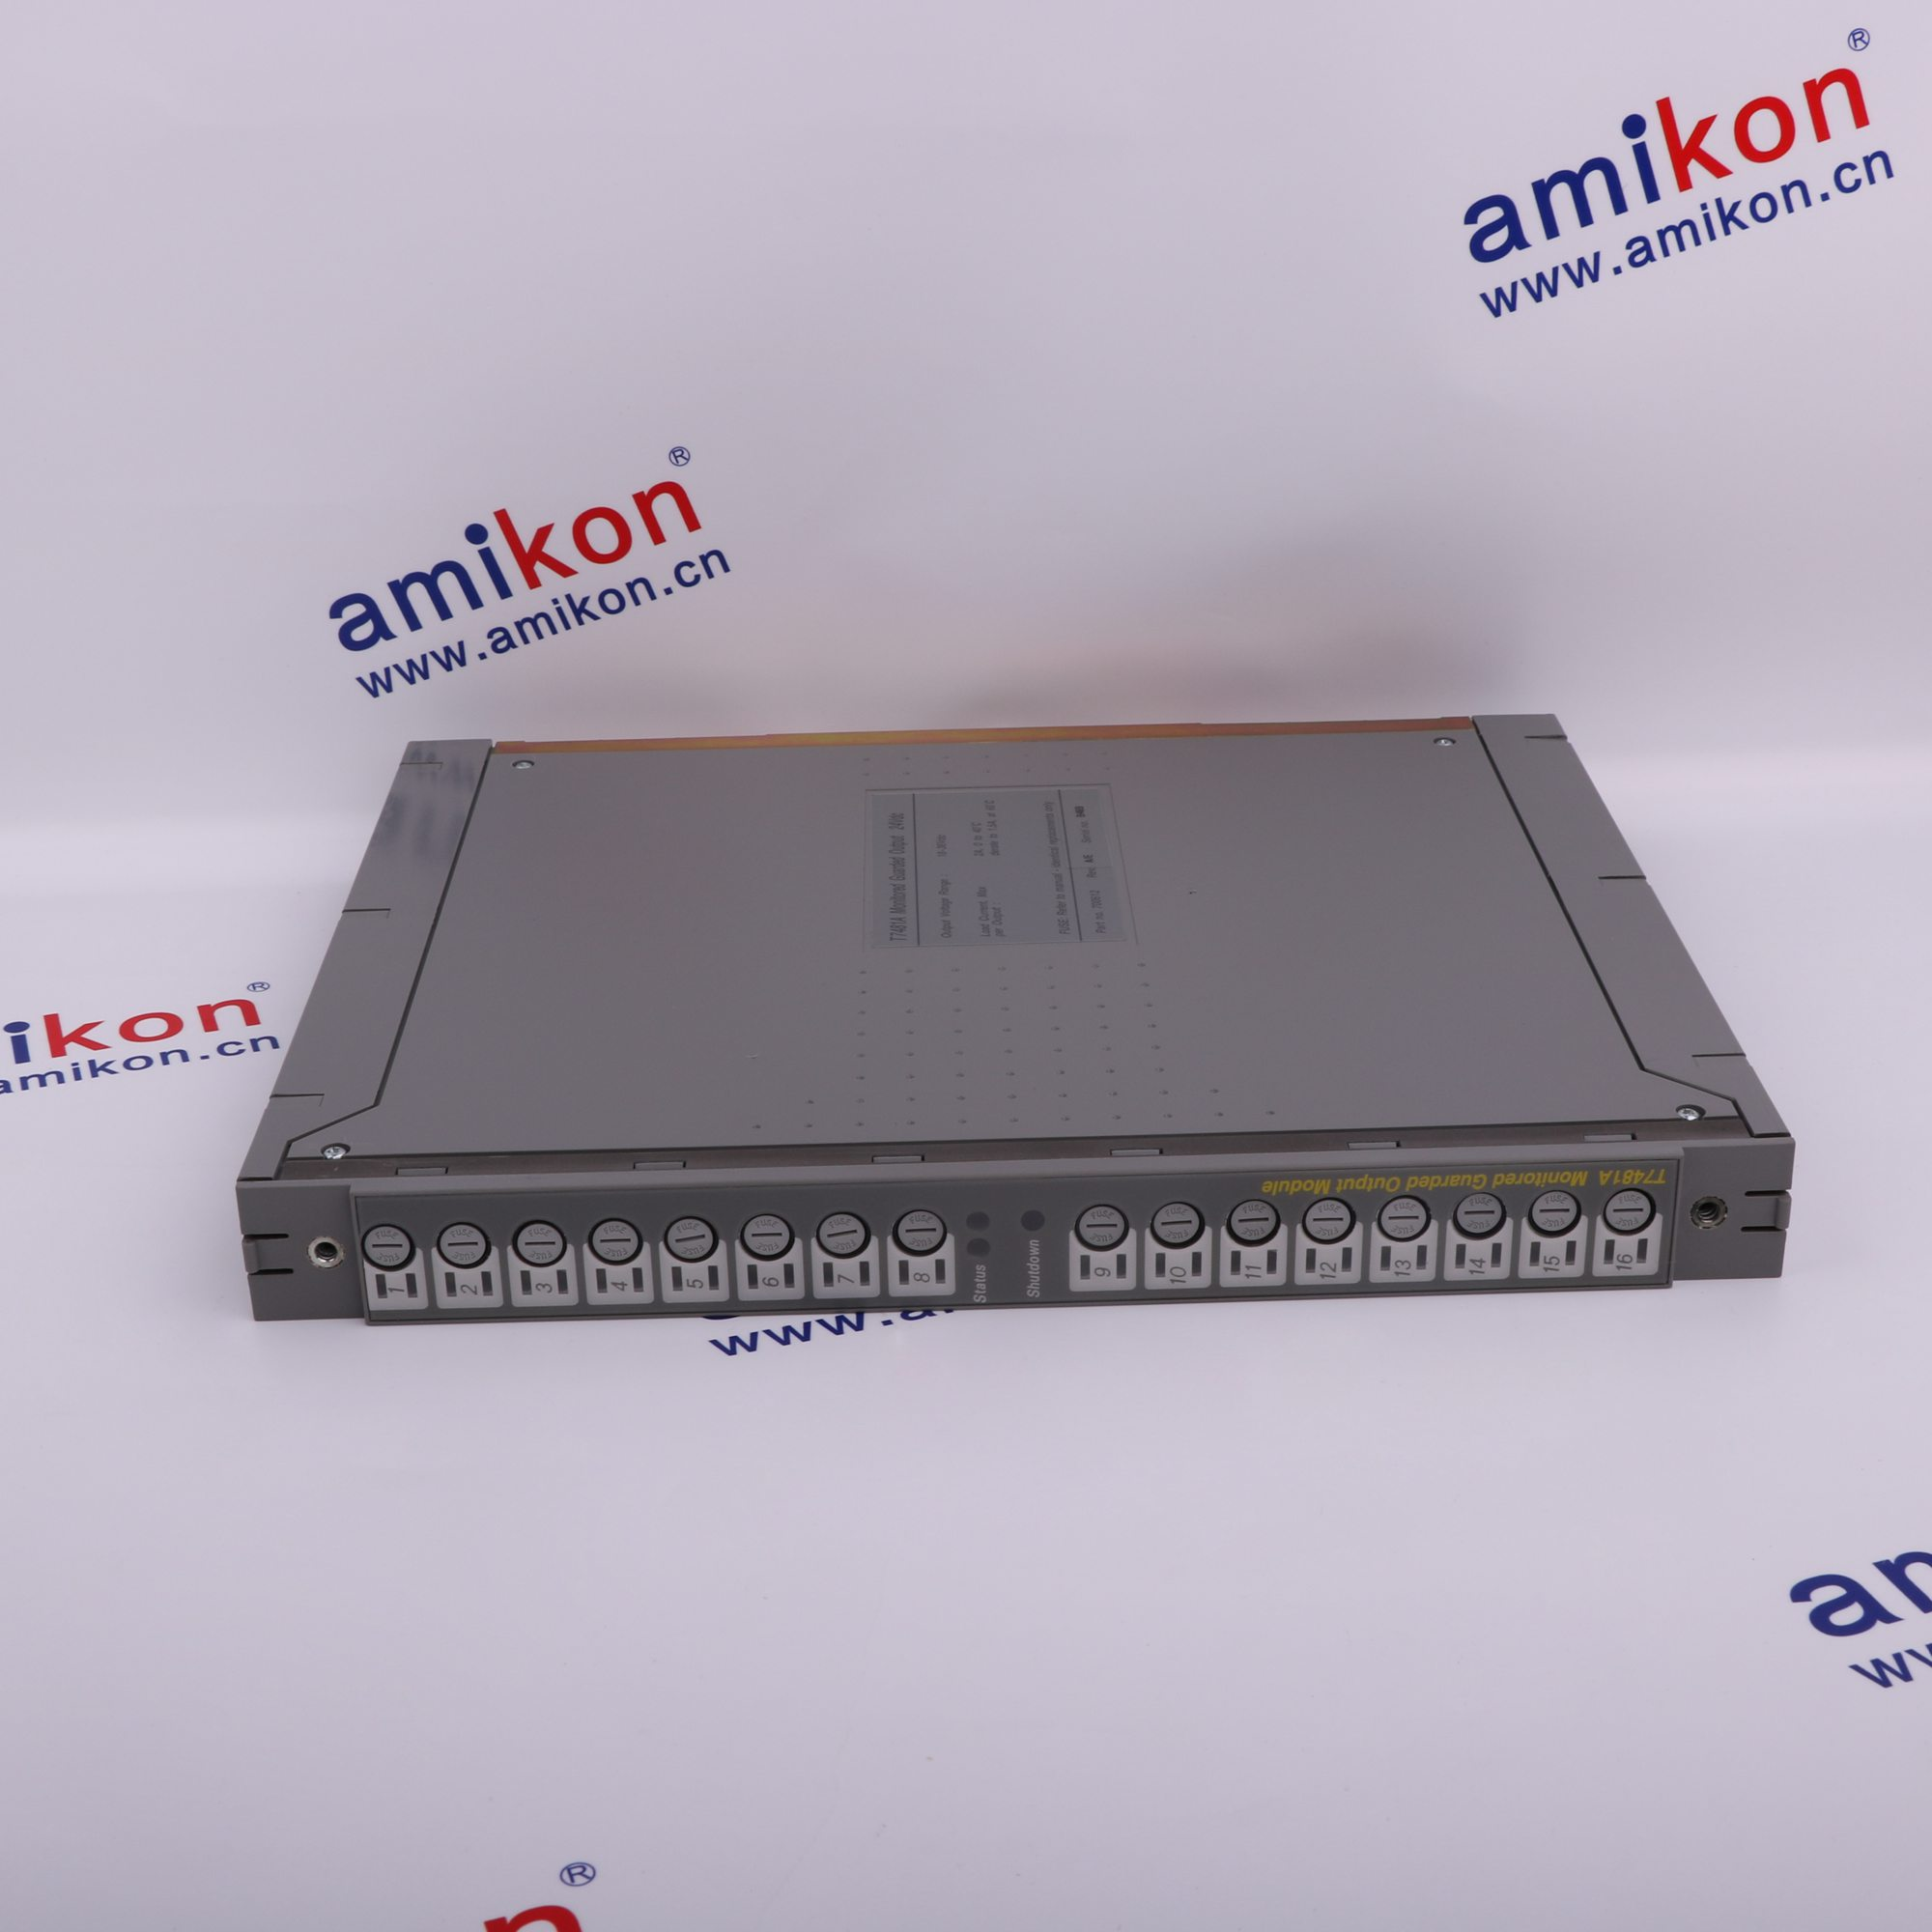 T8451 Trusted TMR 24Vdc Digital Output Module